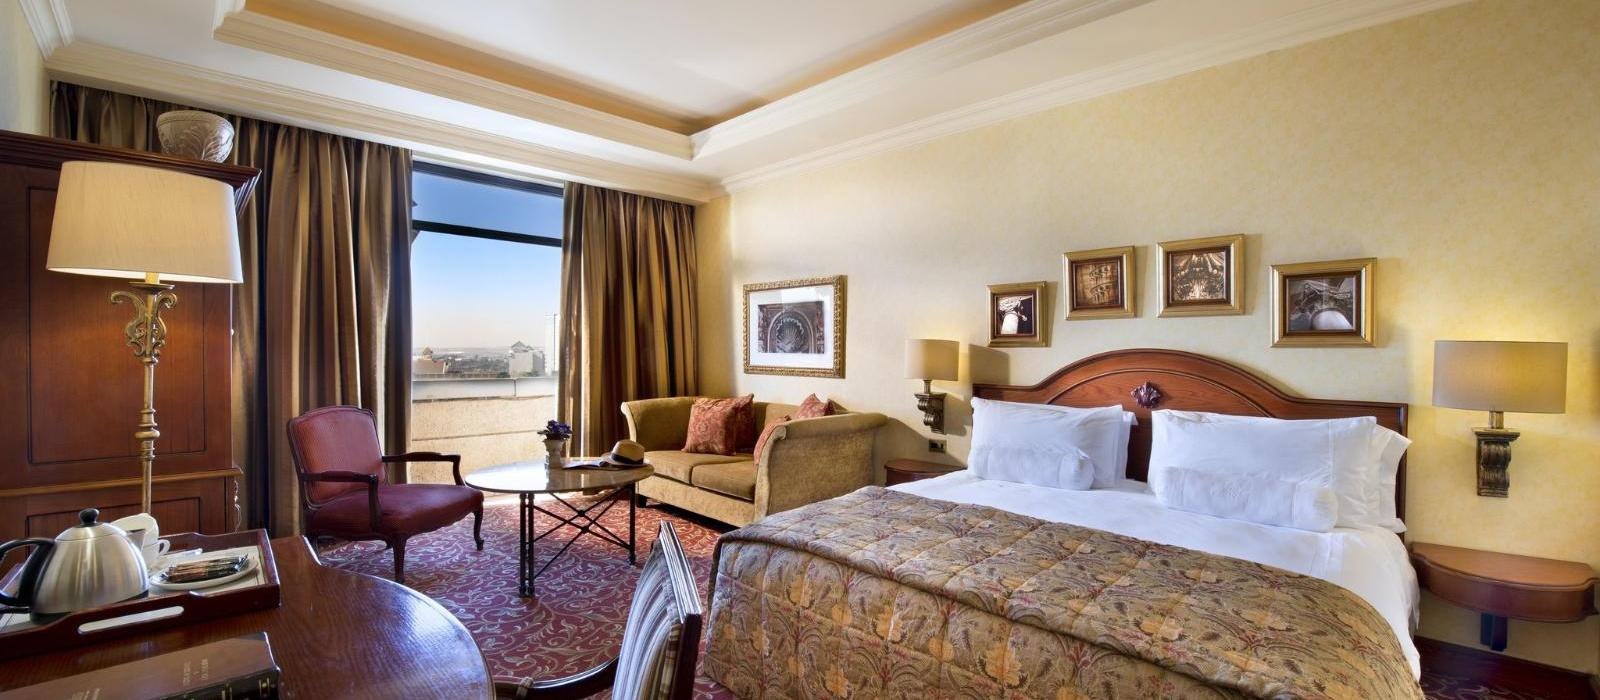 米开朗基罗大酒店(The Michelangelo Hotel) 图片  www.lhw.cn